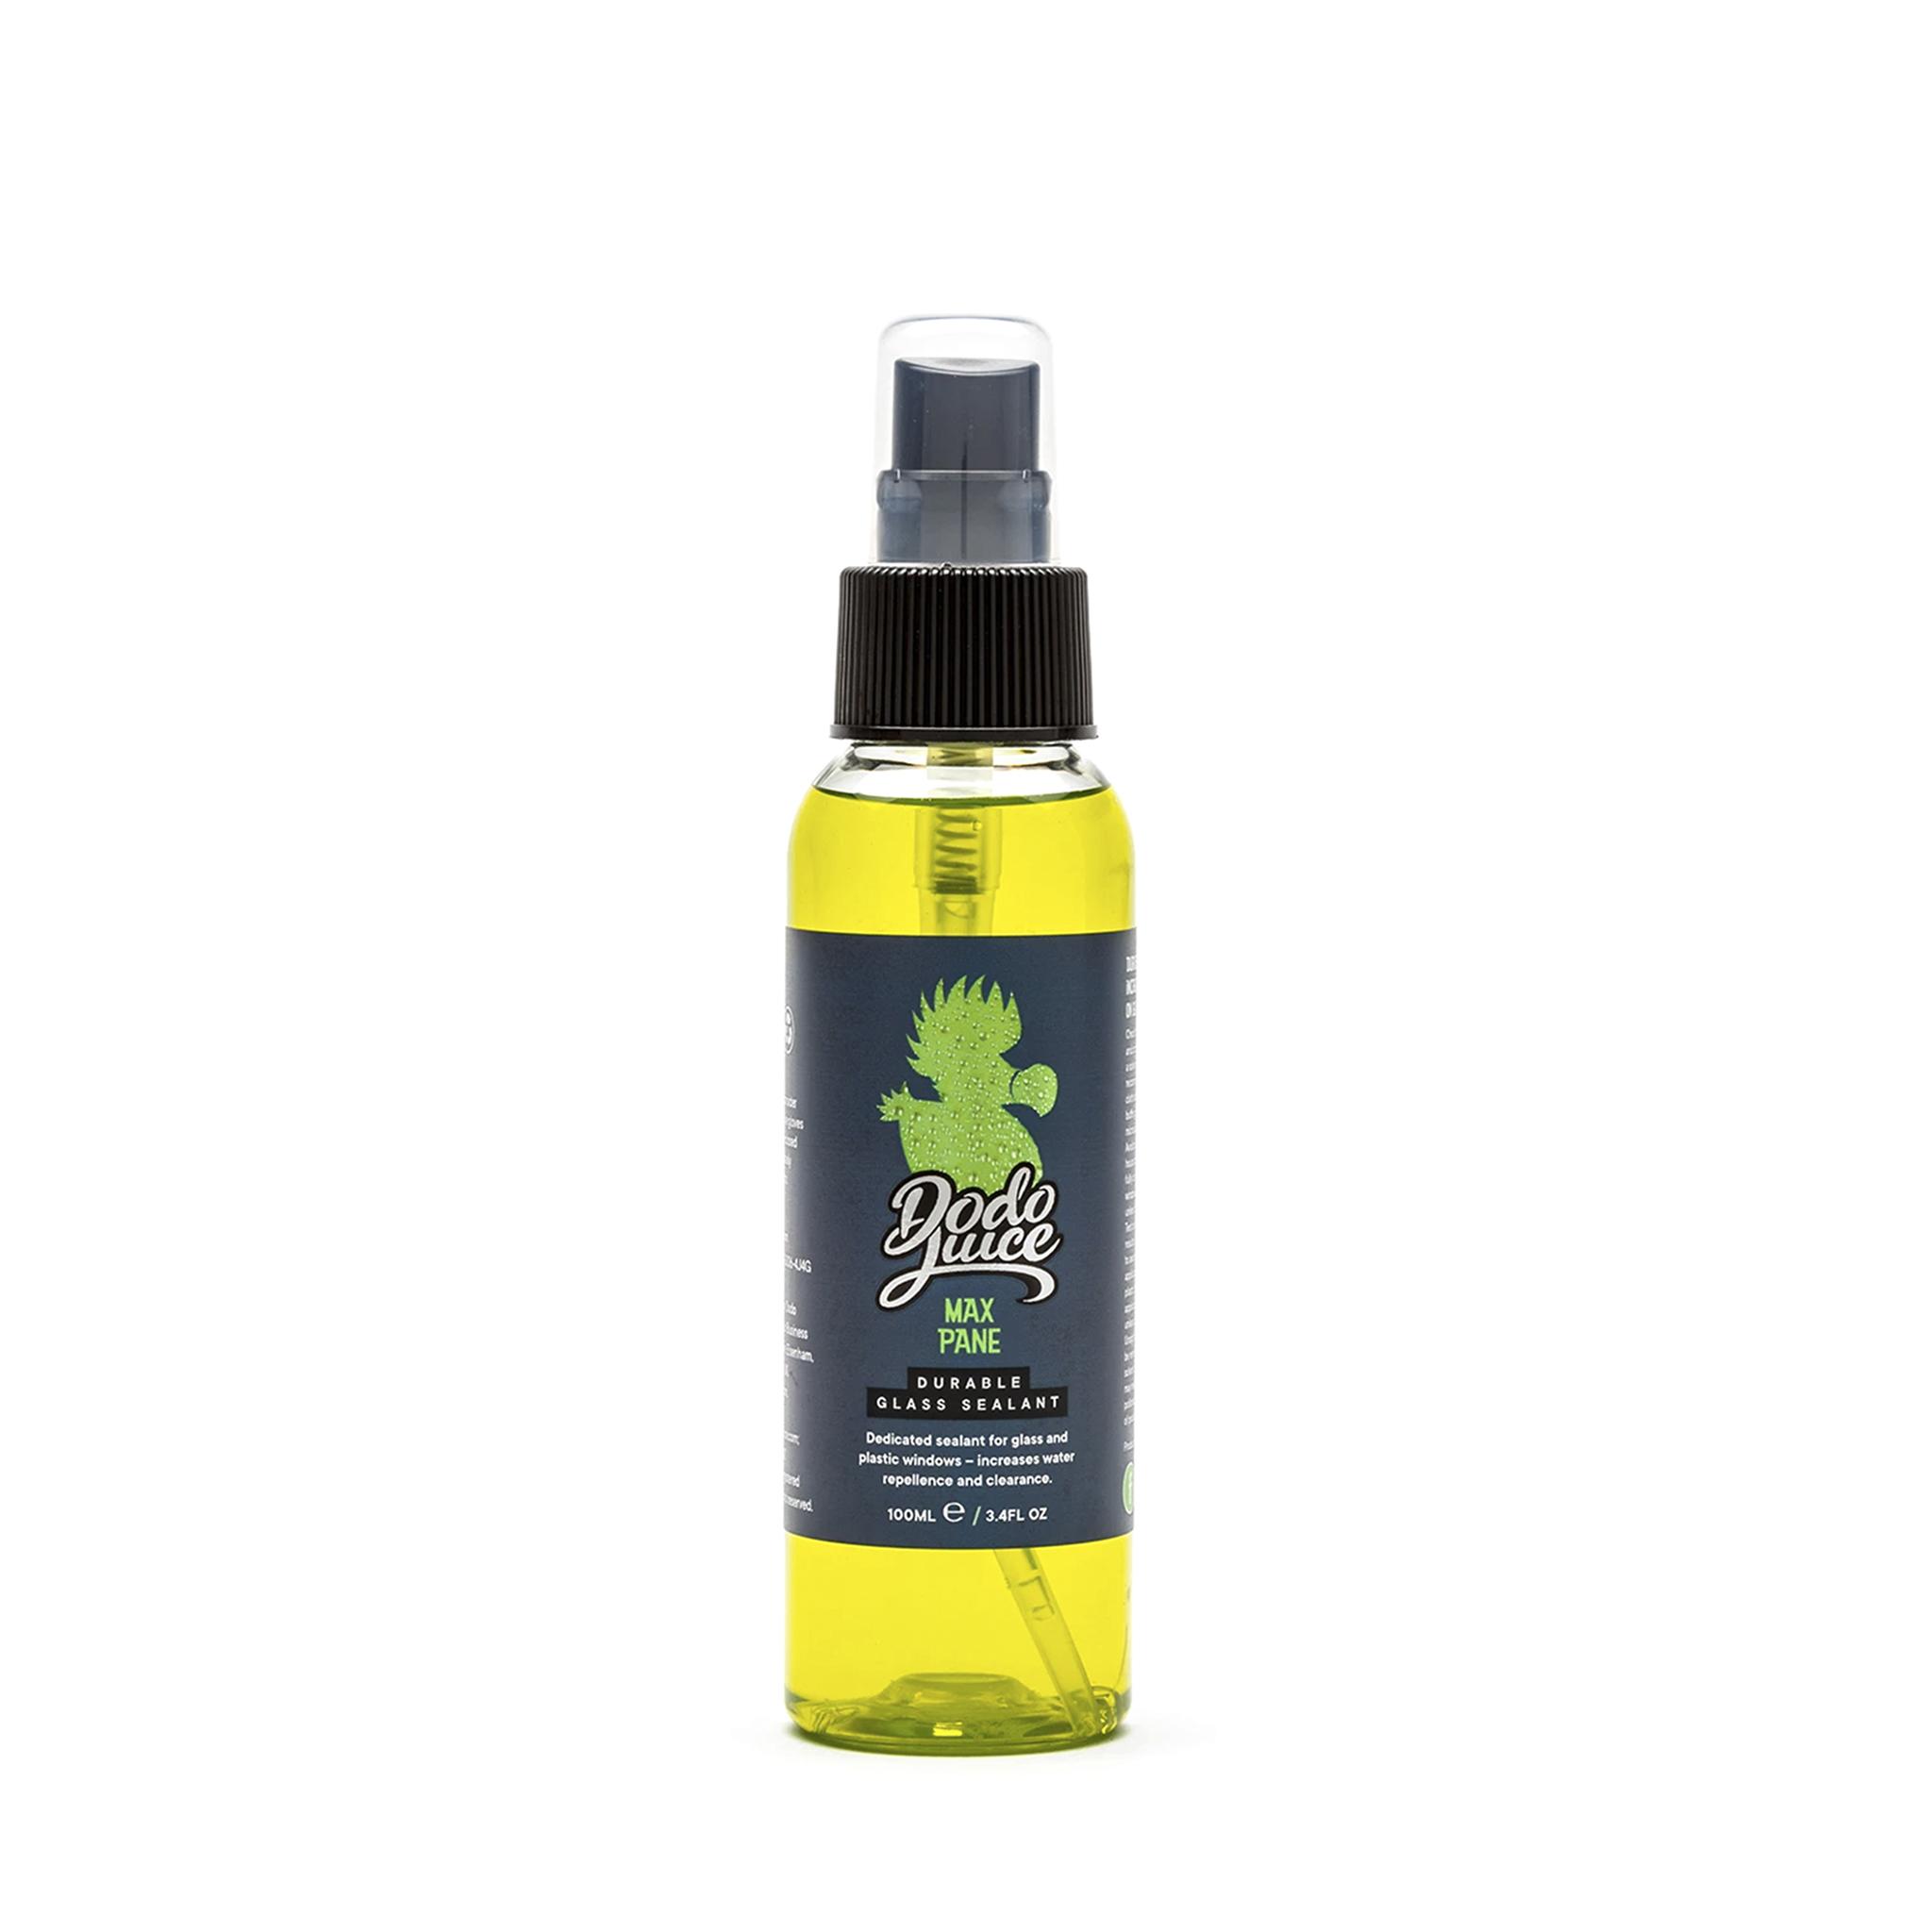 Glasförsegling Dodo Juice Max Pane, 100 ml / Spray